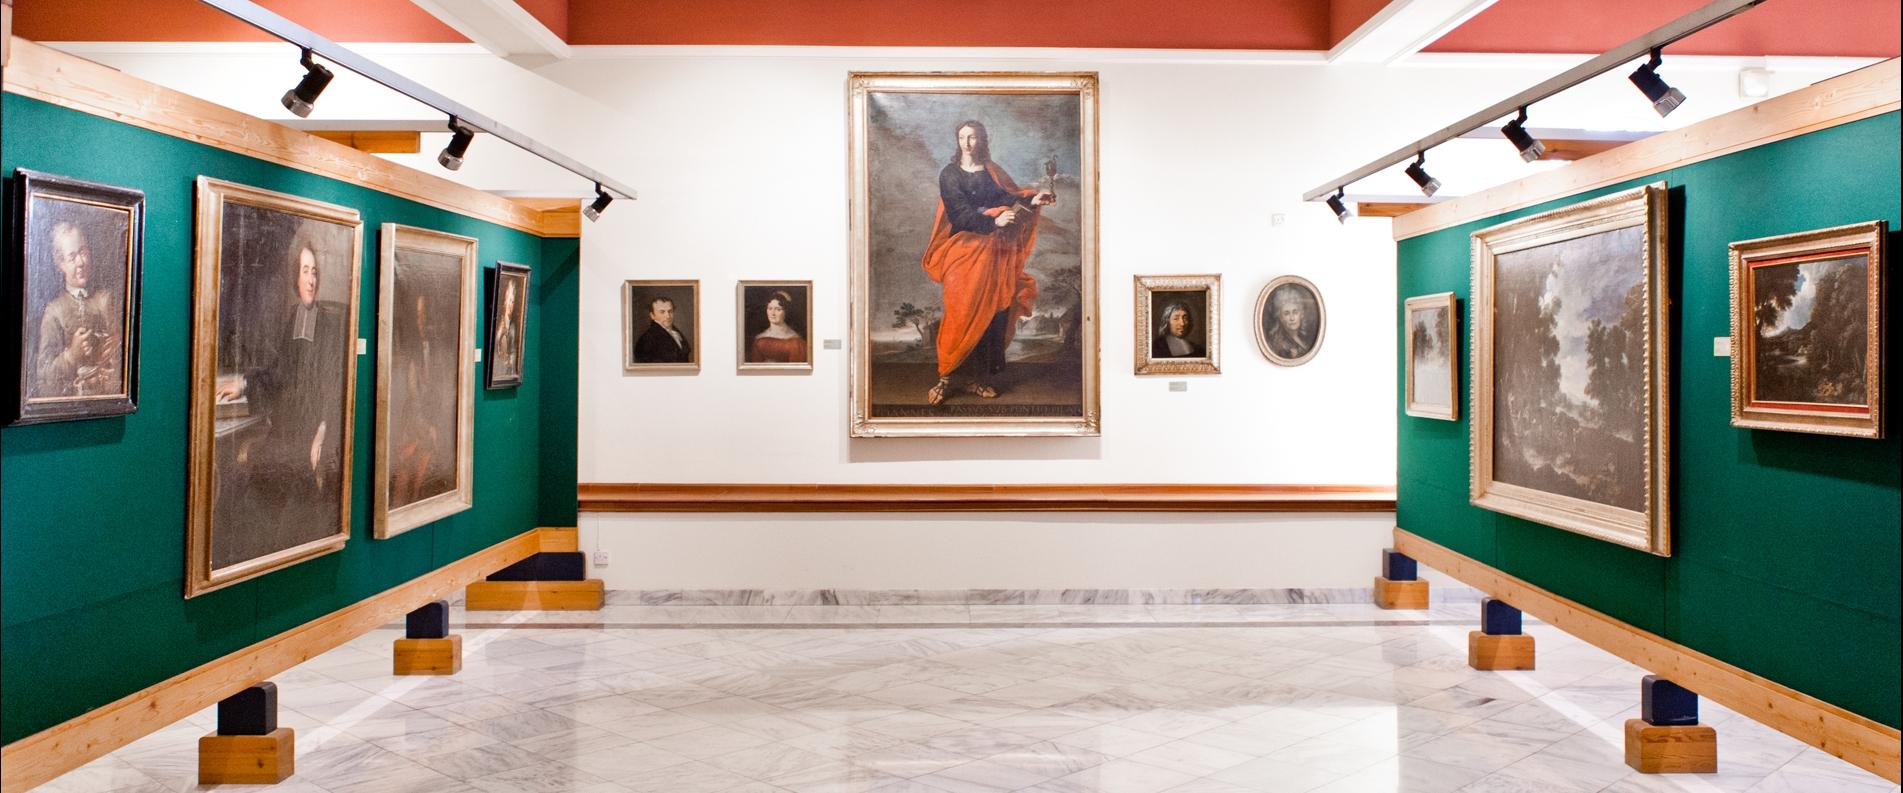 Western-European Art Gallery